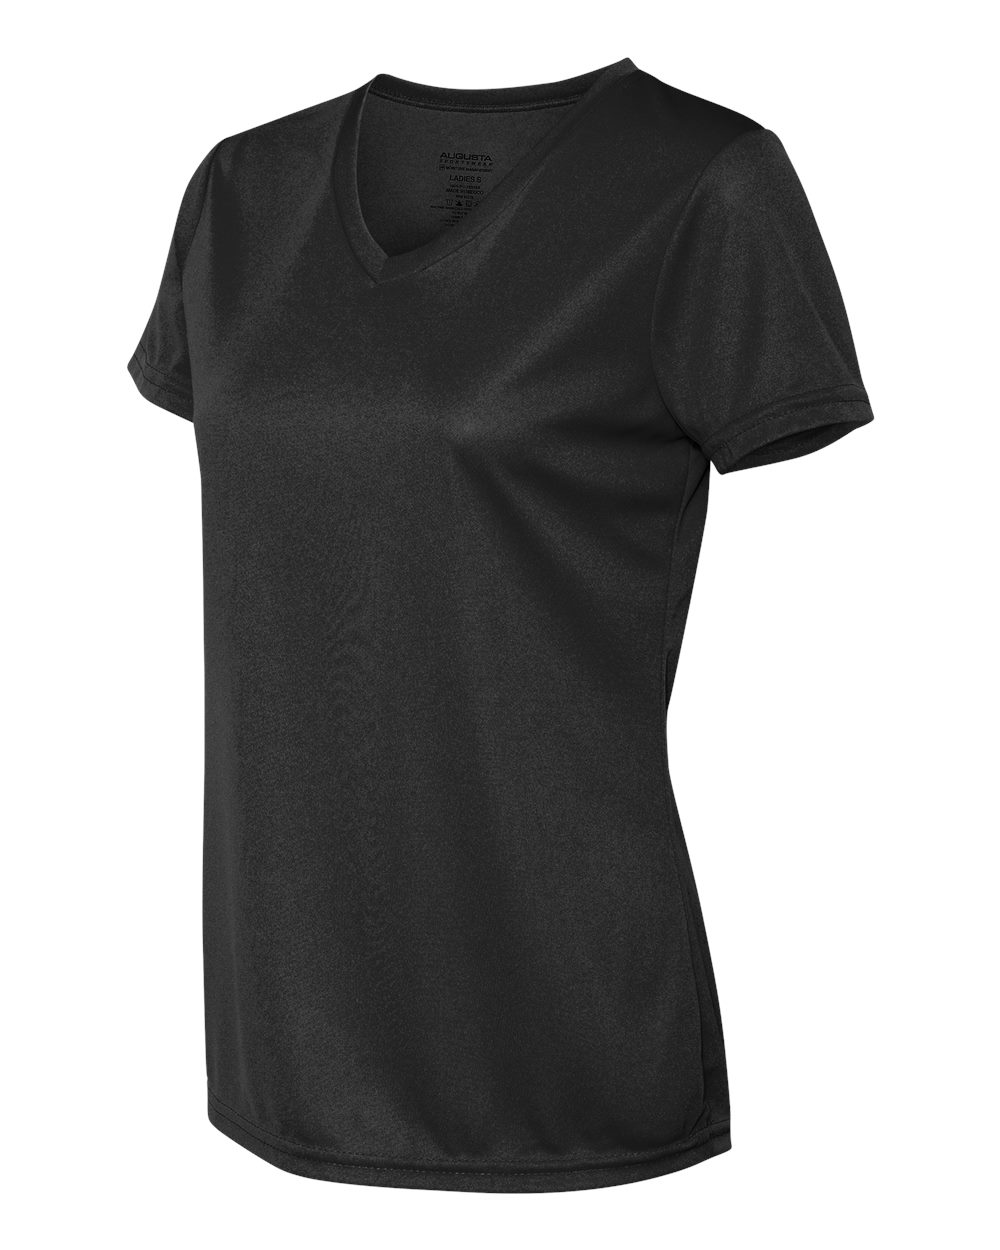 Augusta-Sportswear-Women-039-s-Moisture-Wicking-V-Neck-T-Shirt-1790-XS-2XL thumbnail 9